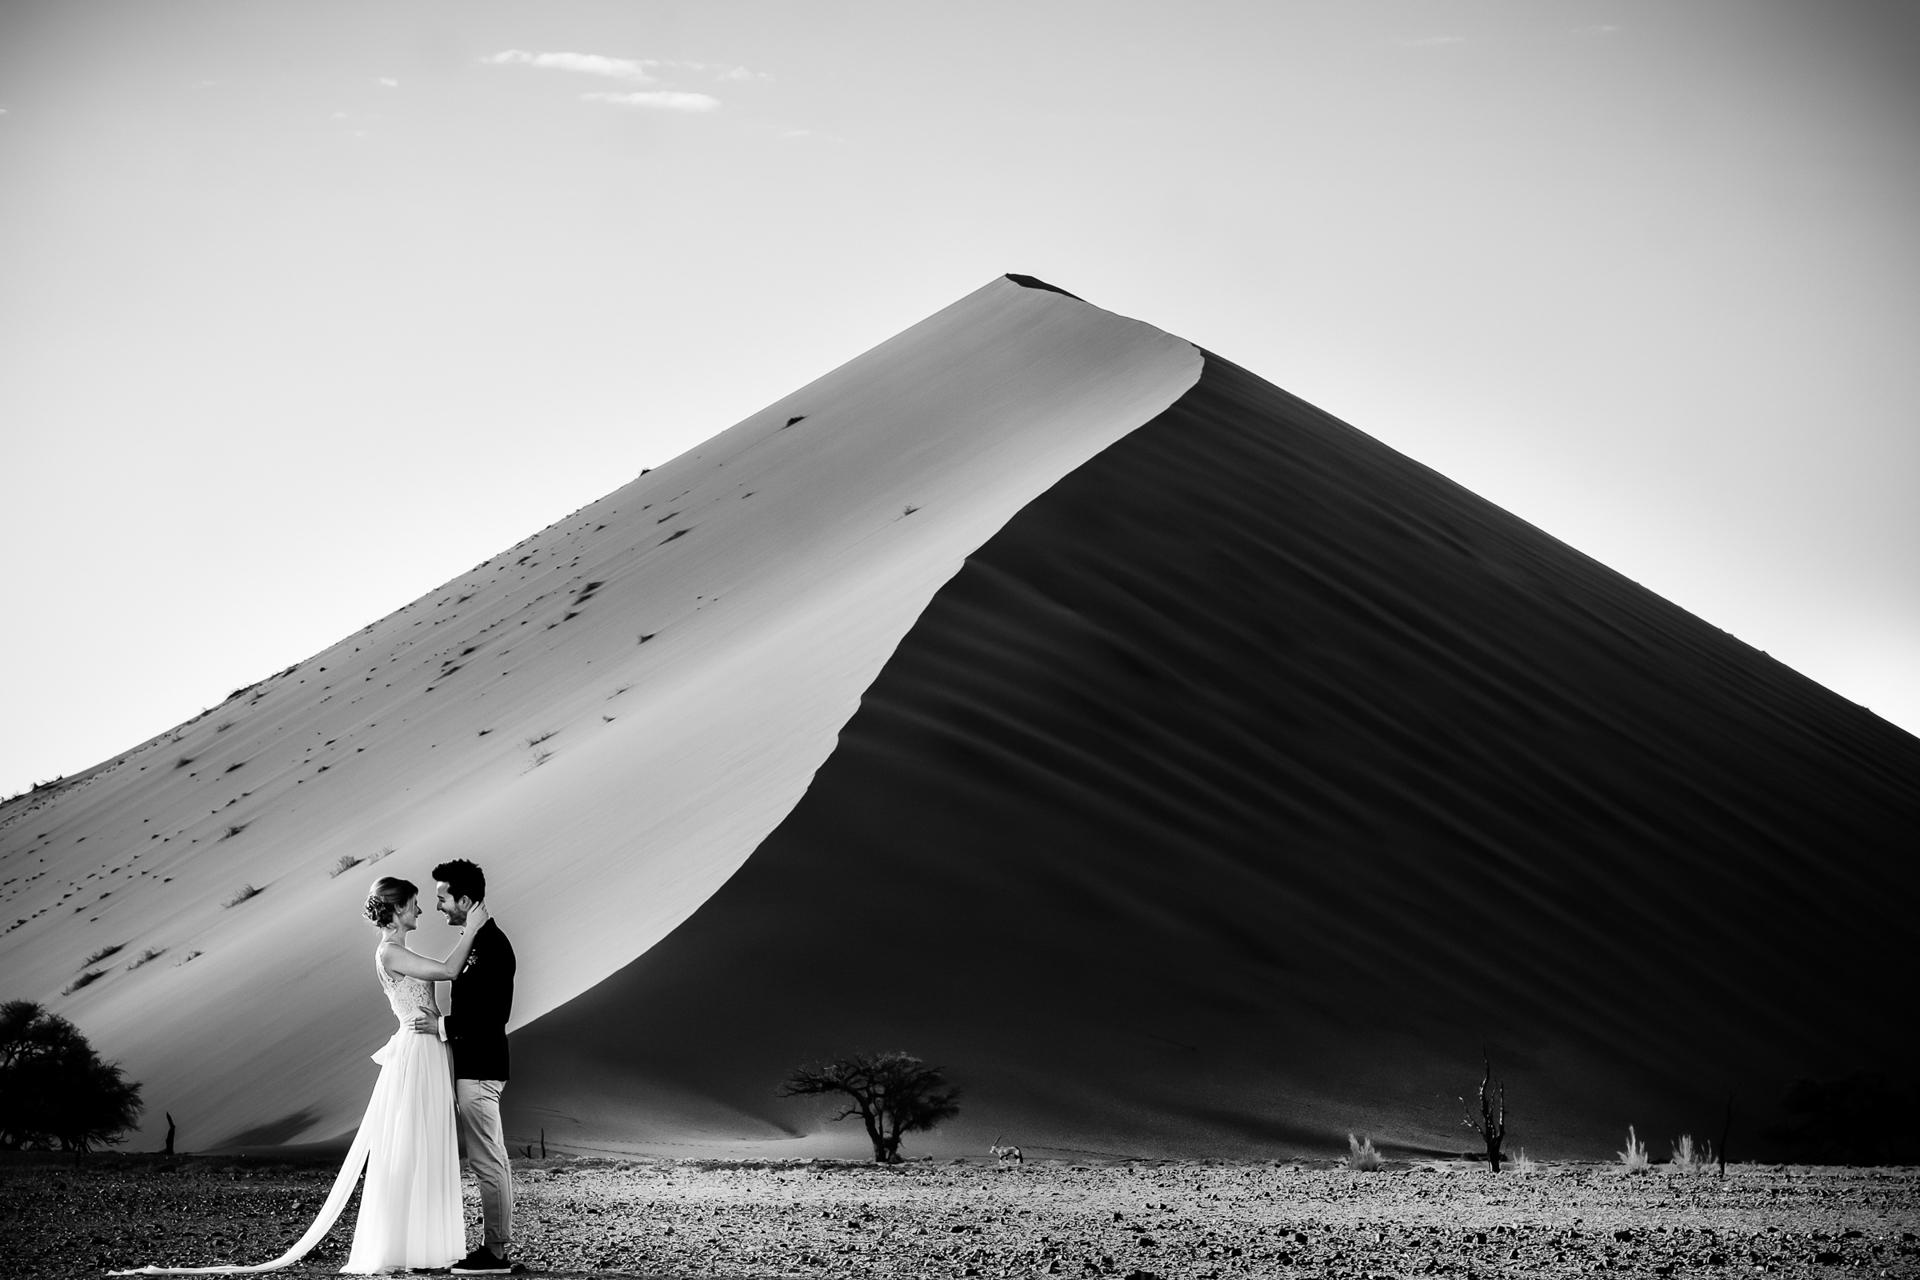 Namib Desert - Namibia Elopement Portrait | the nature reserve's majestic sand dunes